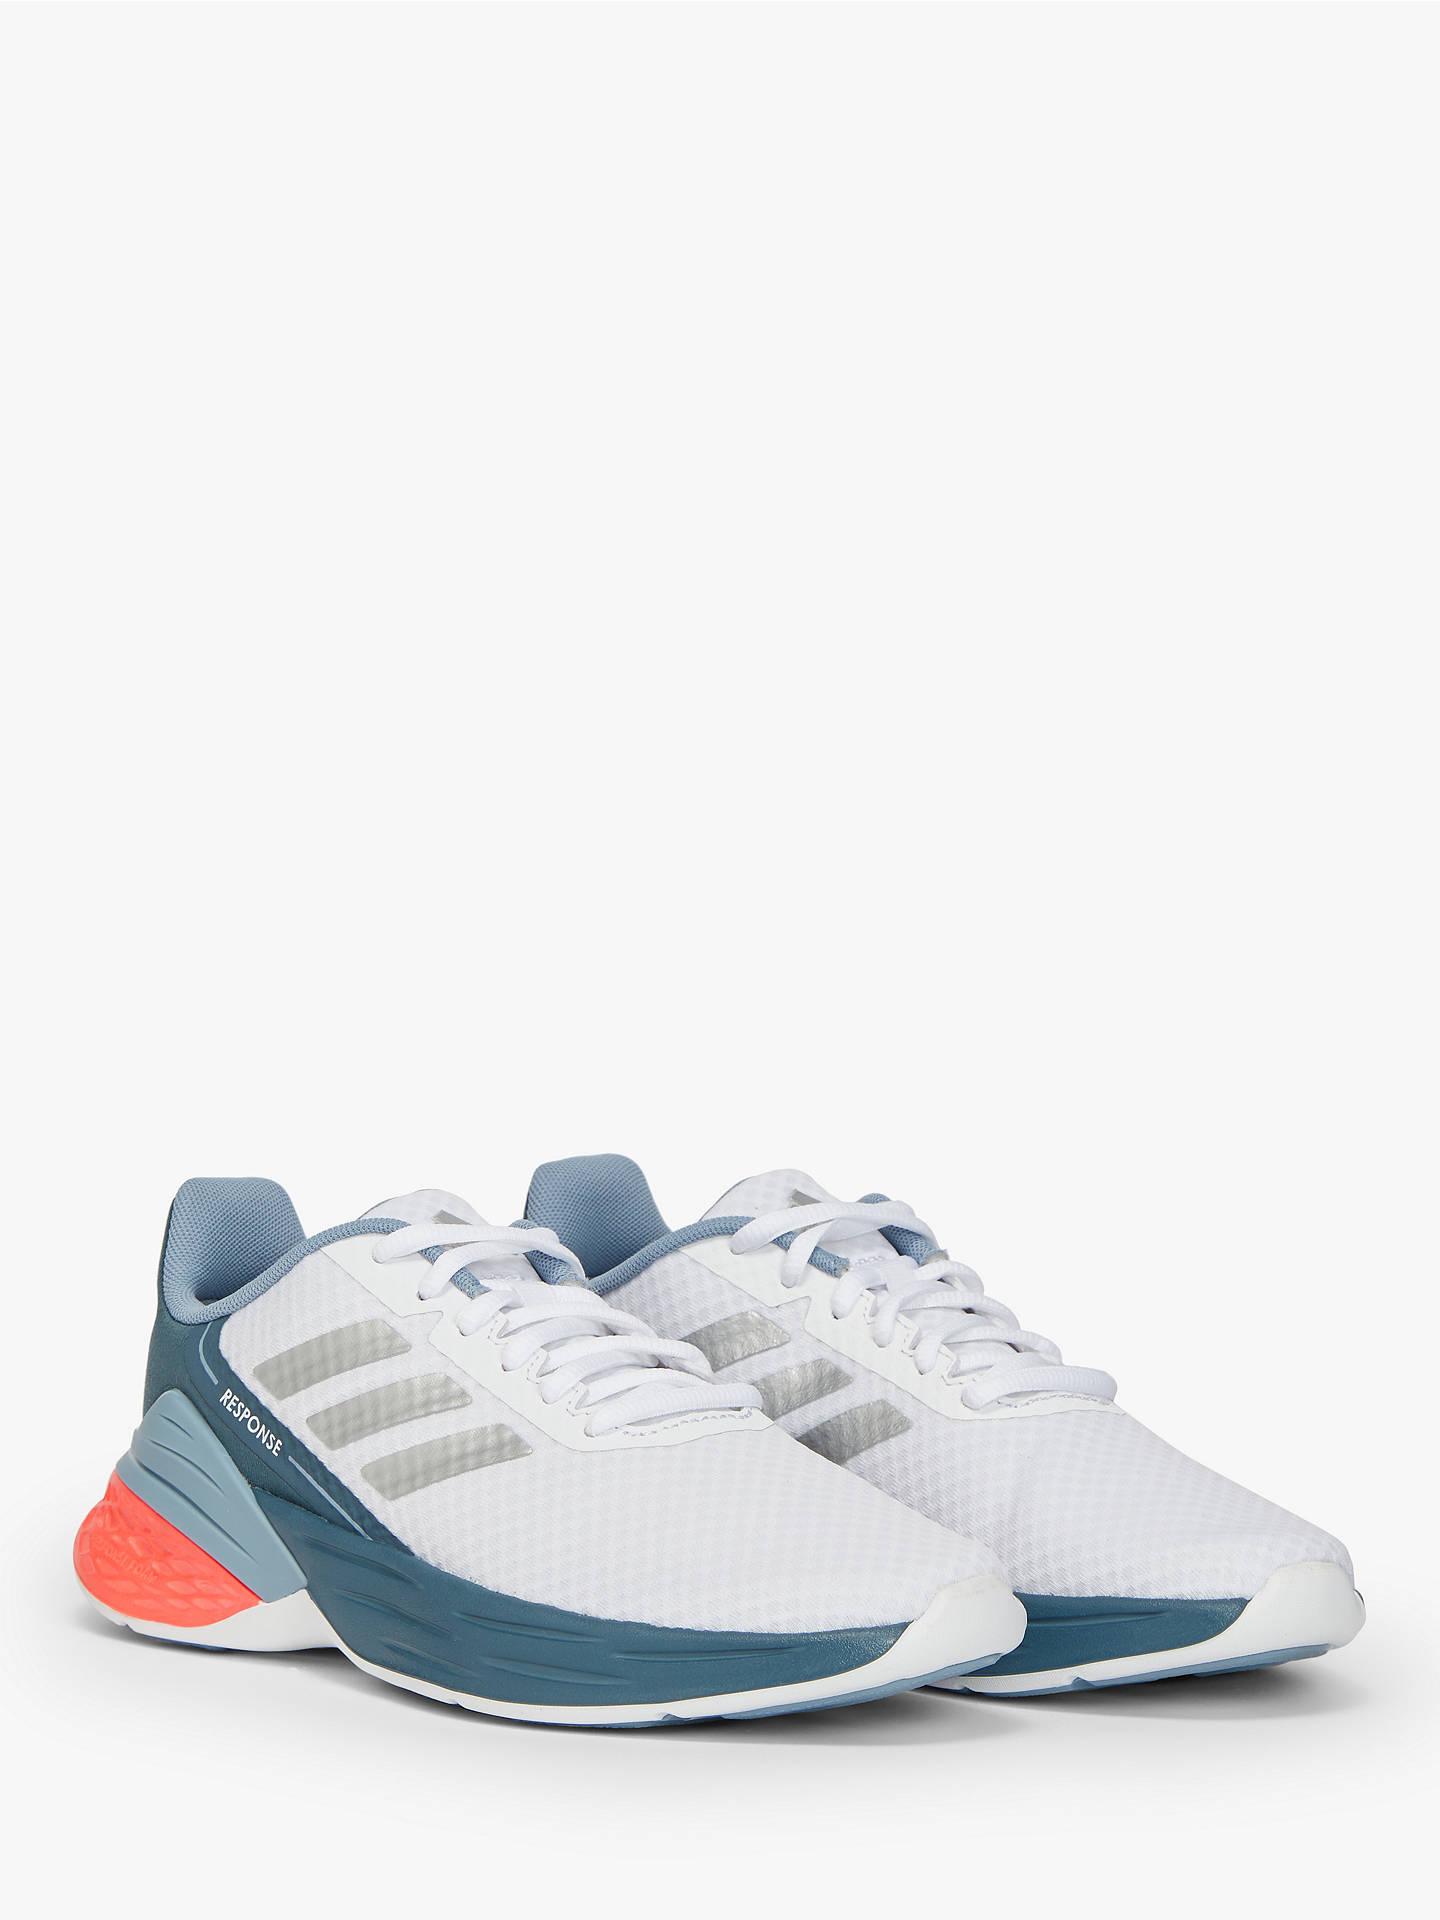 Men's adidas Response SR Running Shoes| Finish Line